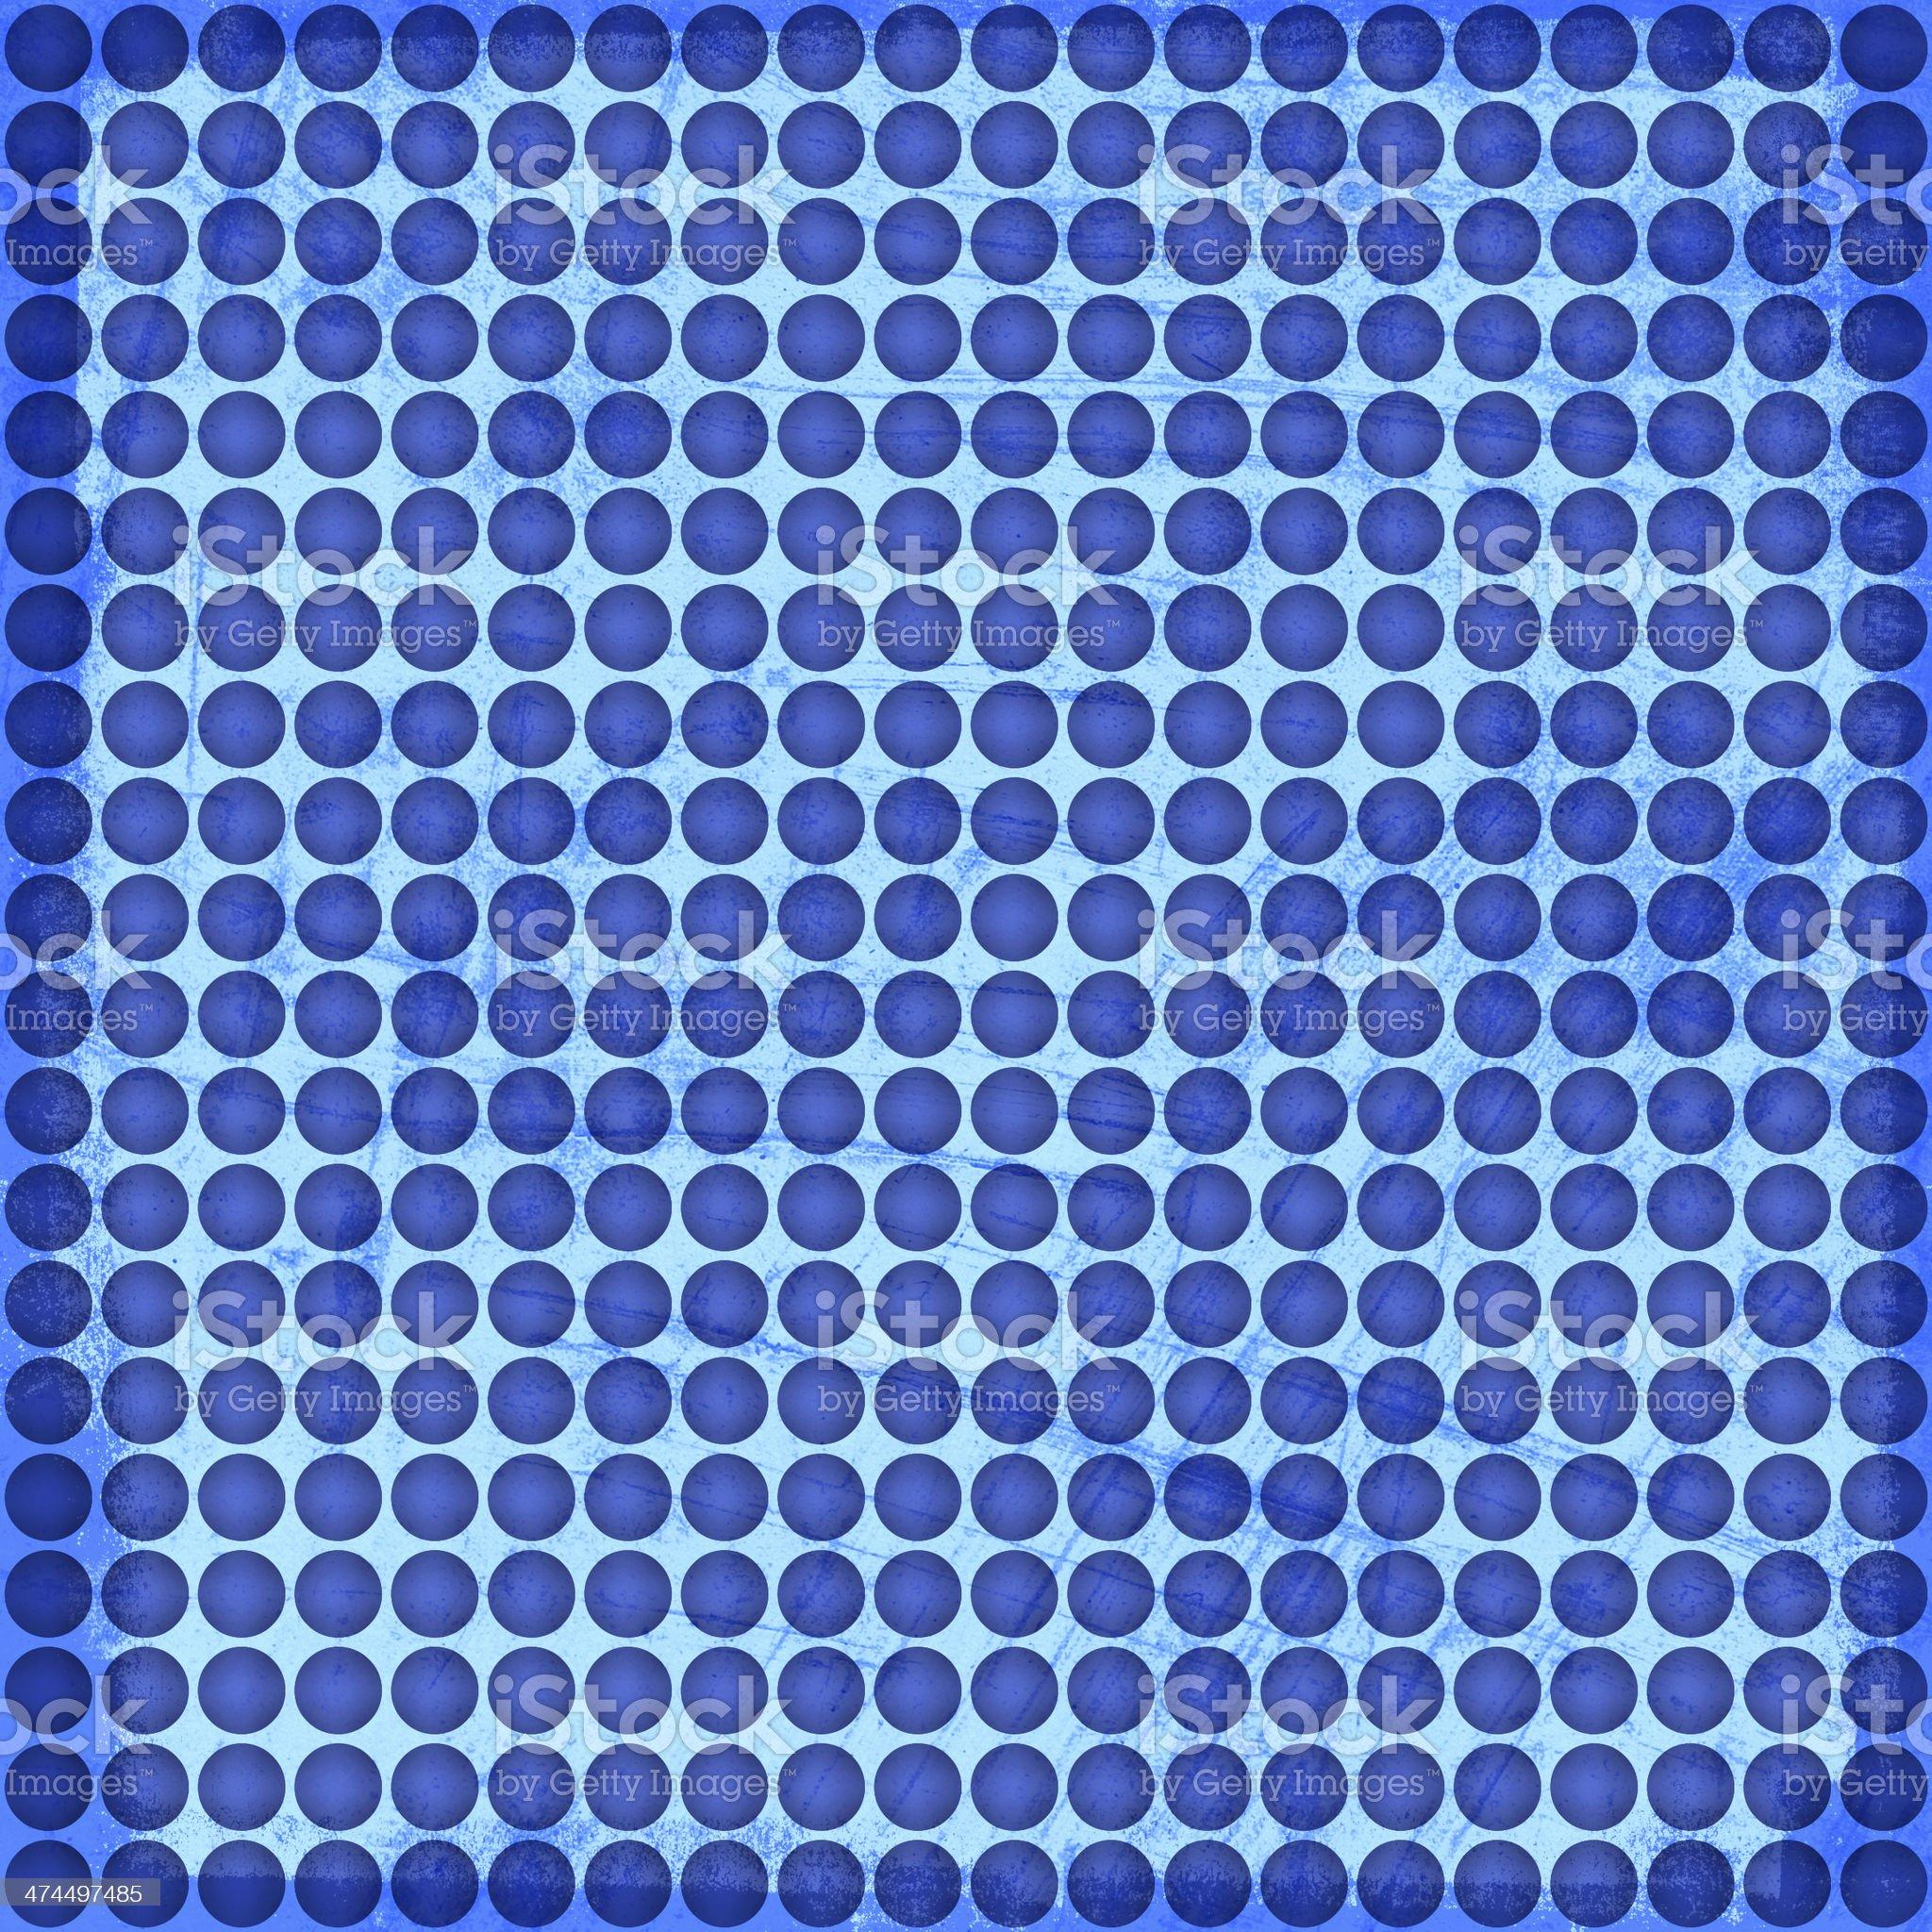 colored circle seamless pattern royalty-free stock photo